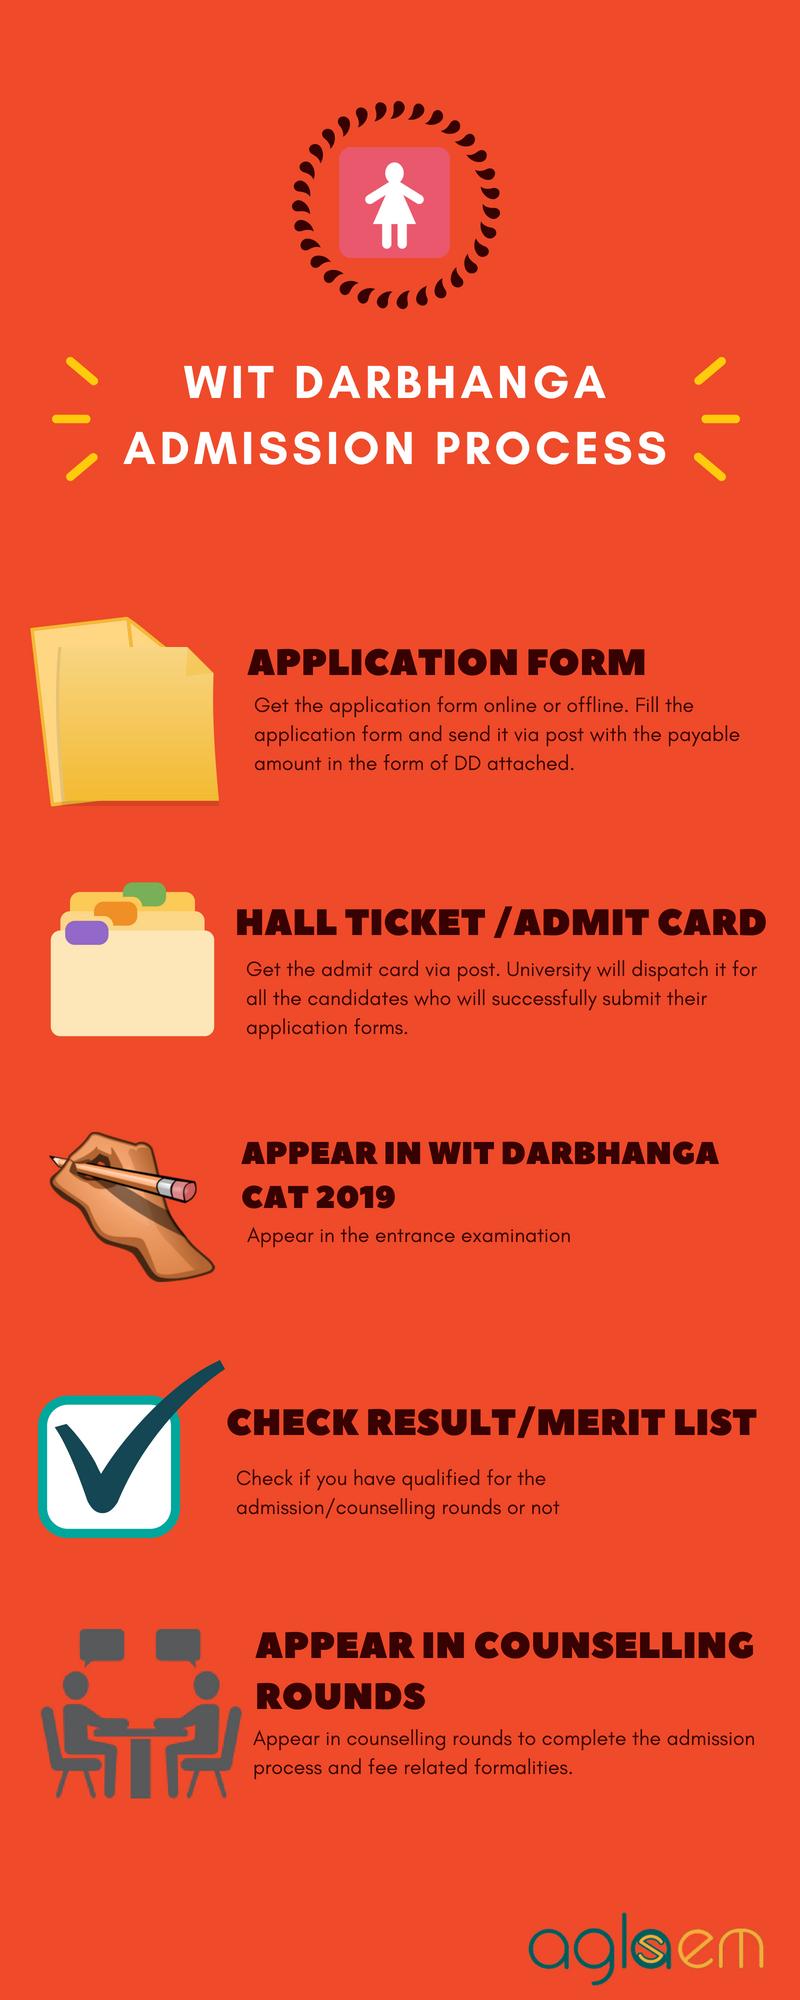 WIT Darbhanga CAT 2019